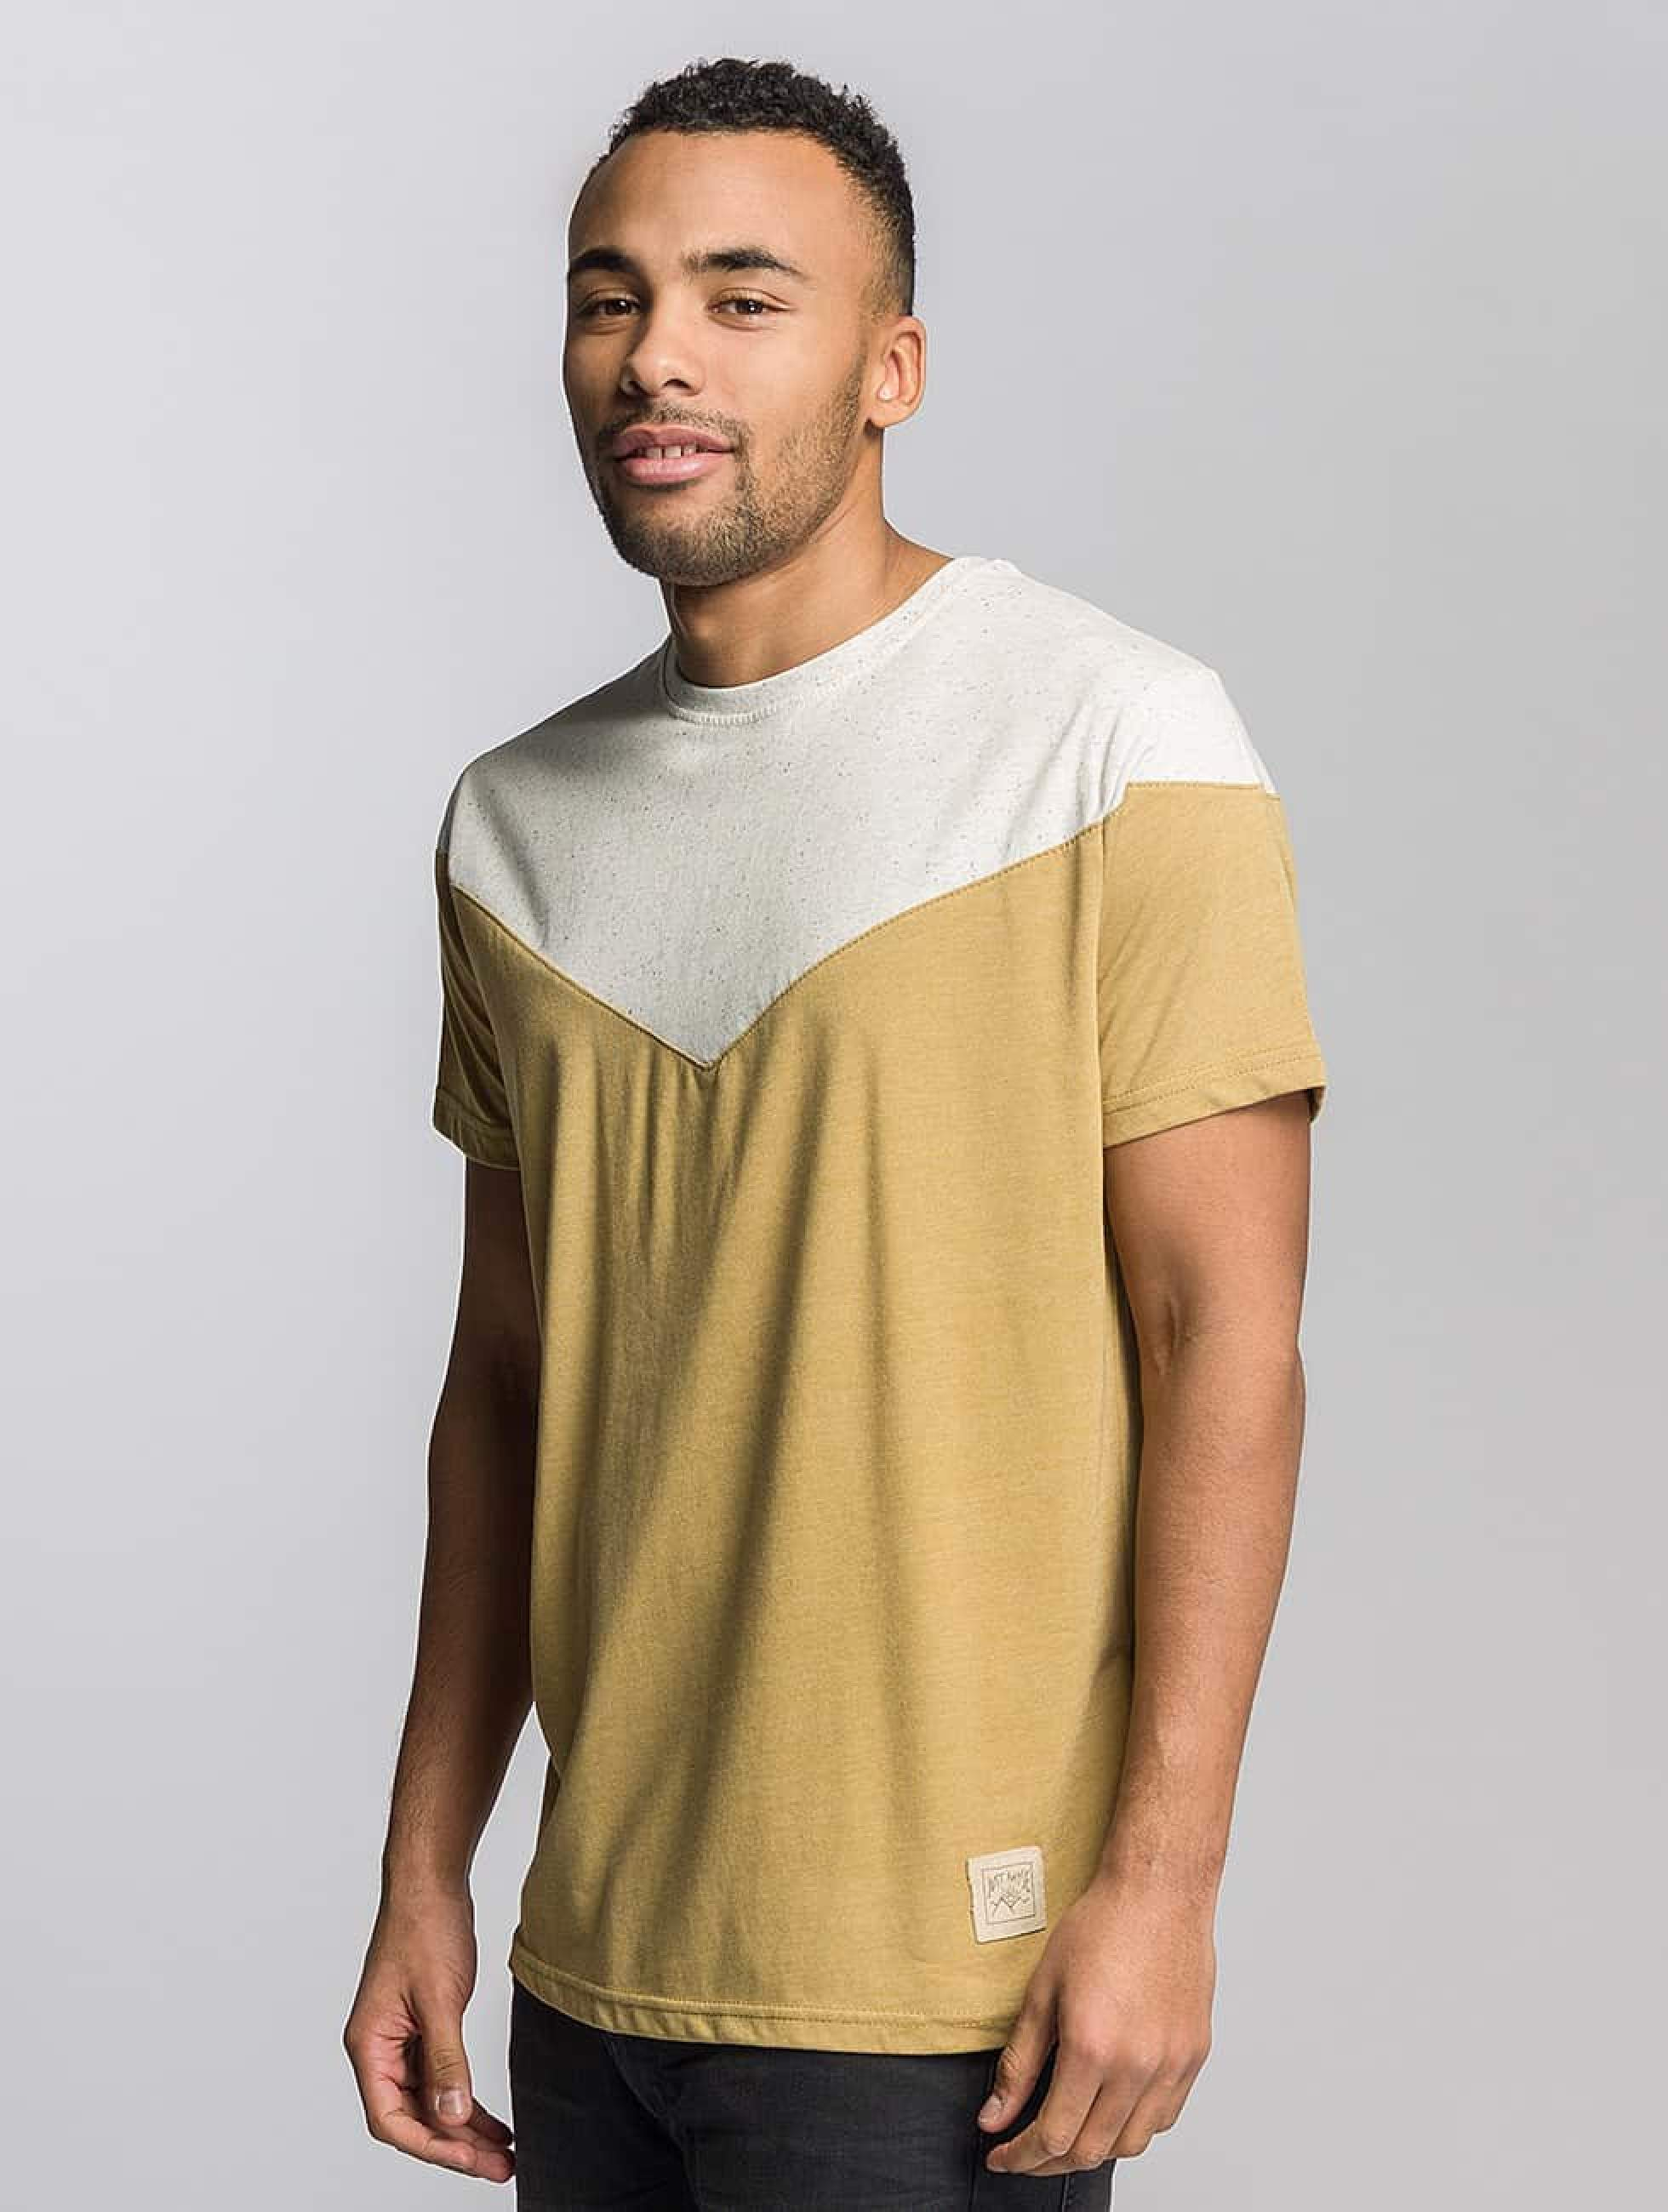 Just Rhyse / T-Shirt Jönköping in khaki S